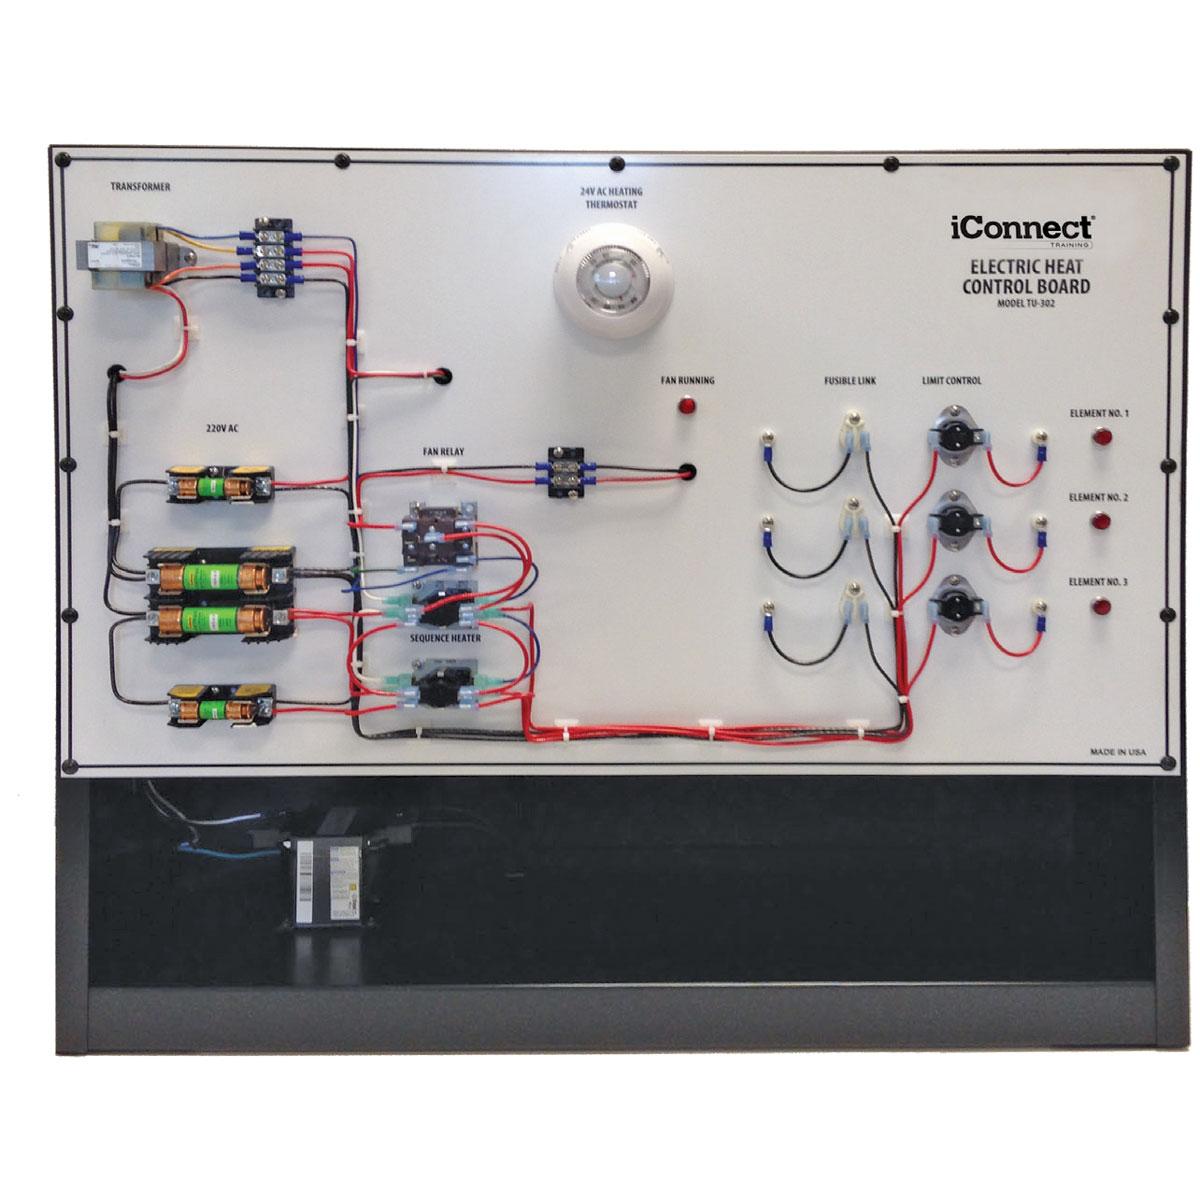 Hvac Control Wiring Most Basic System